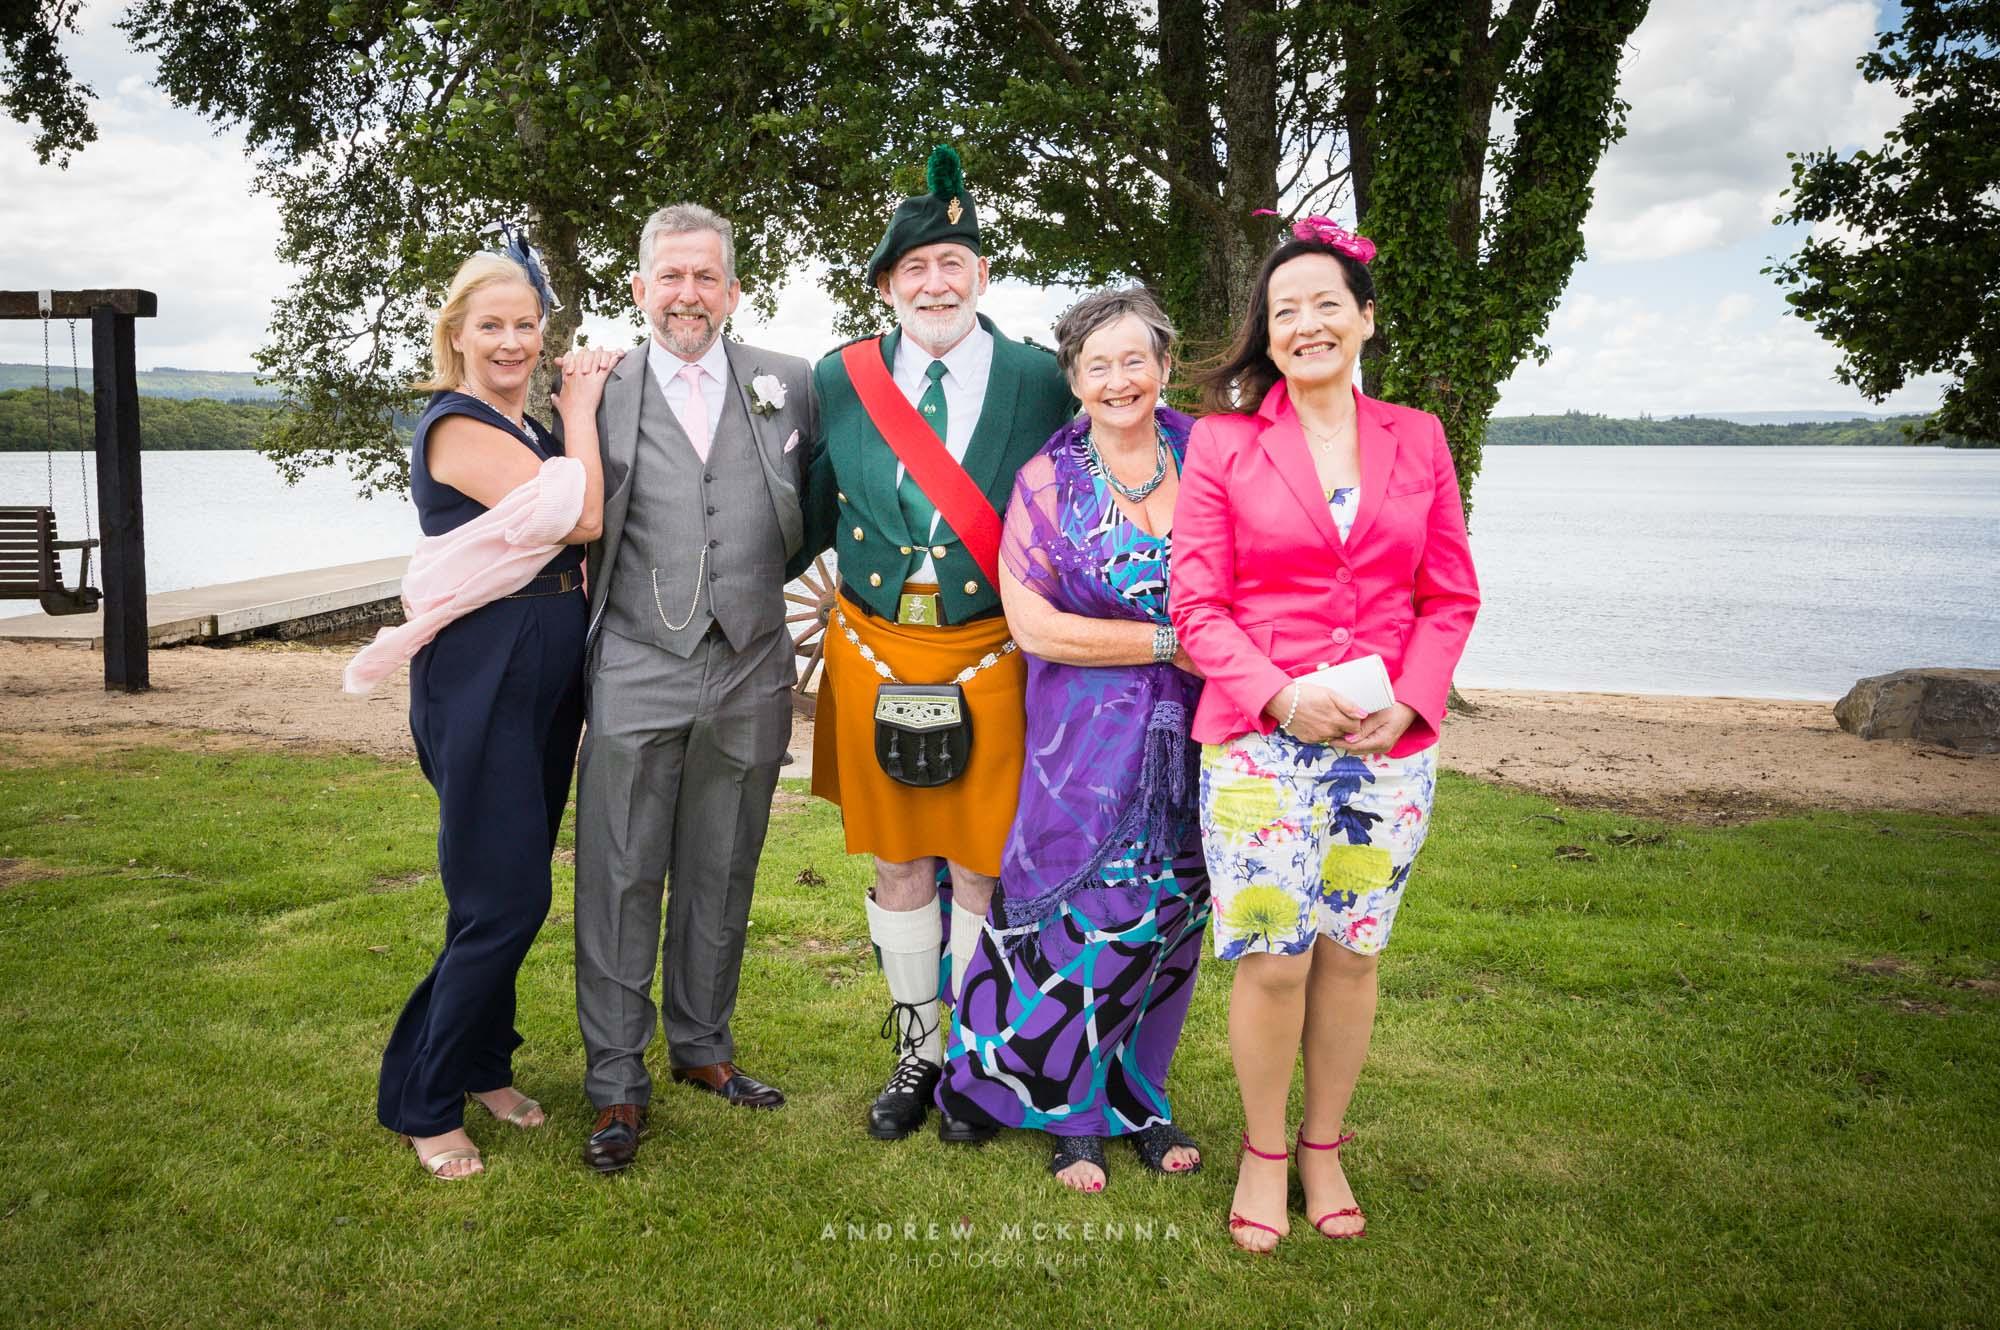 Anna & Ricky Rossharbour Resort on the shores of Lough Erne Wedd